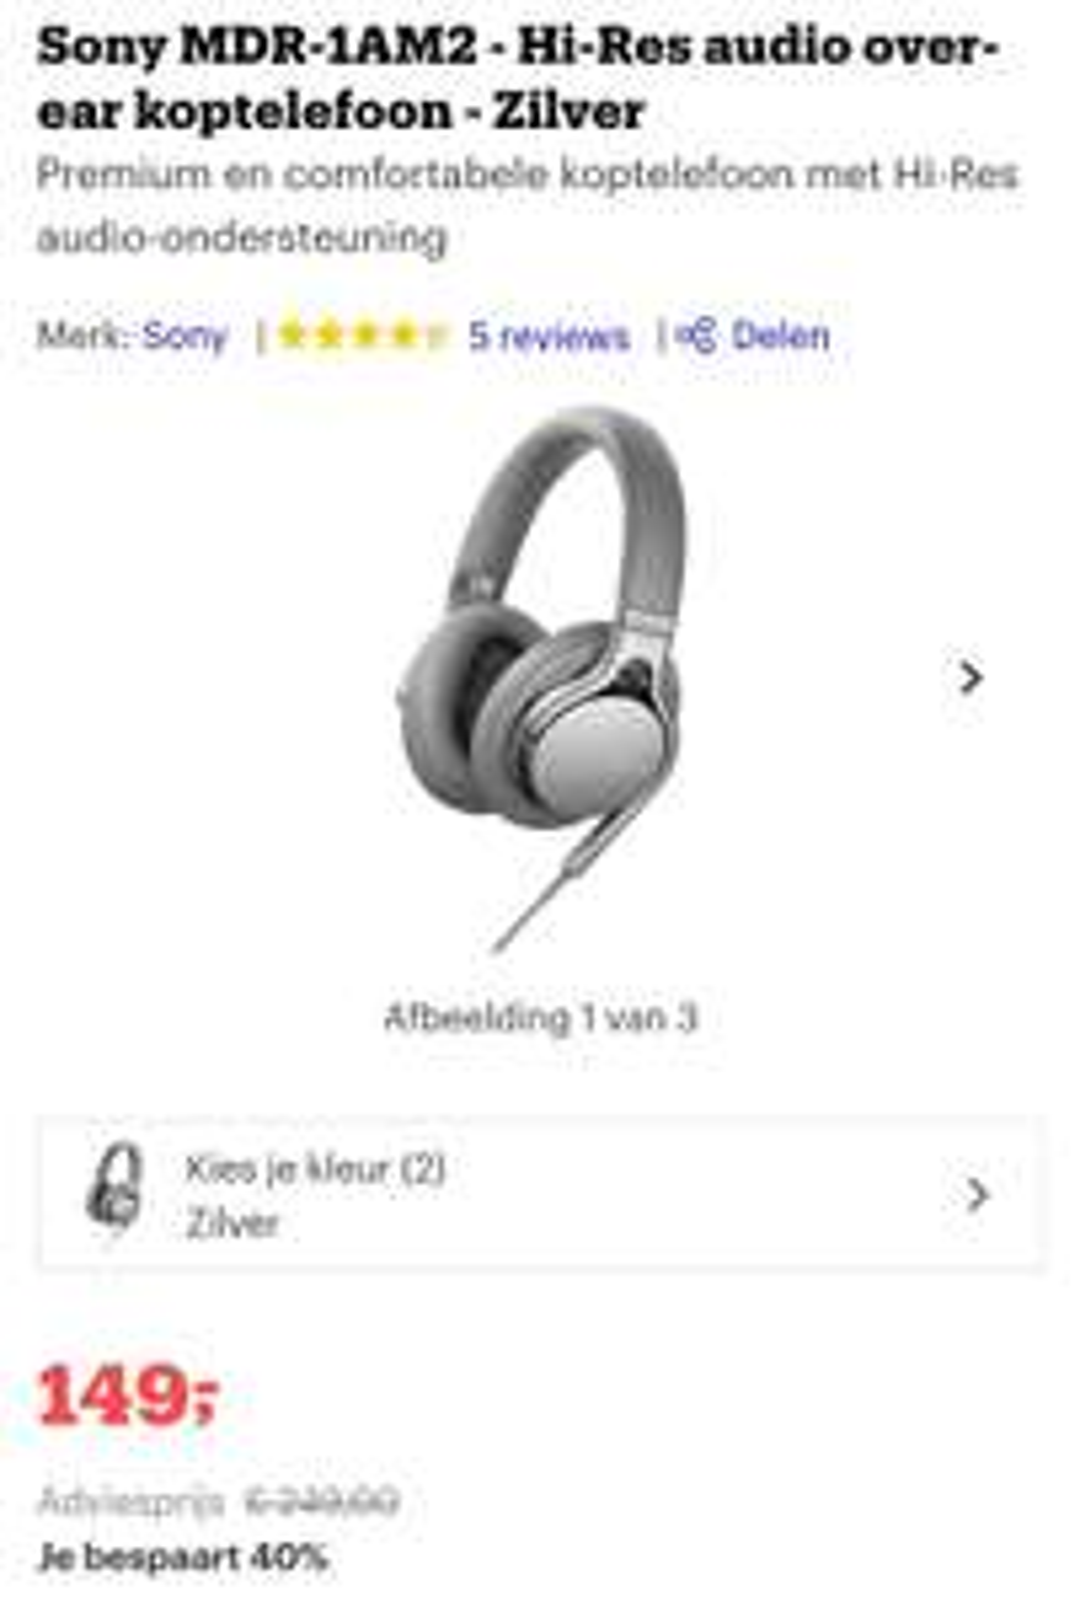 Sony MDR-1AM2 - Hi-Res audio over-ear koptelefoon - Zilver